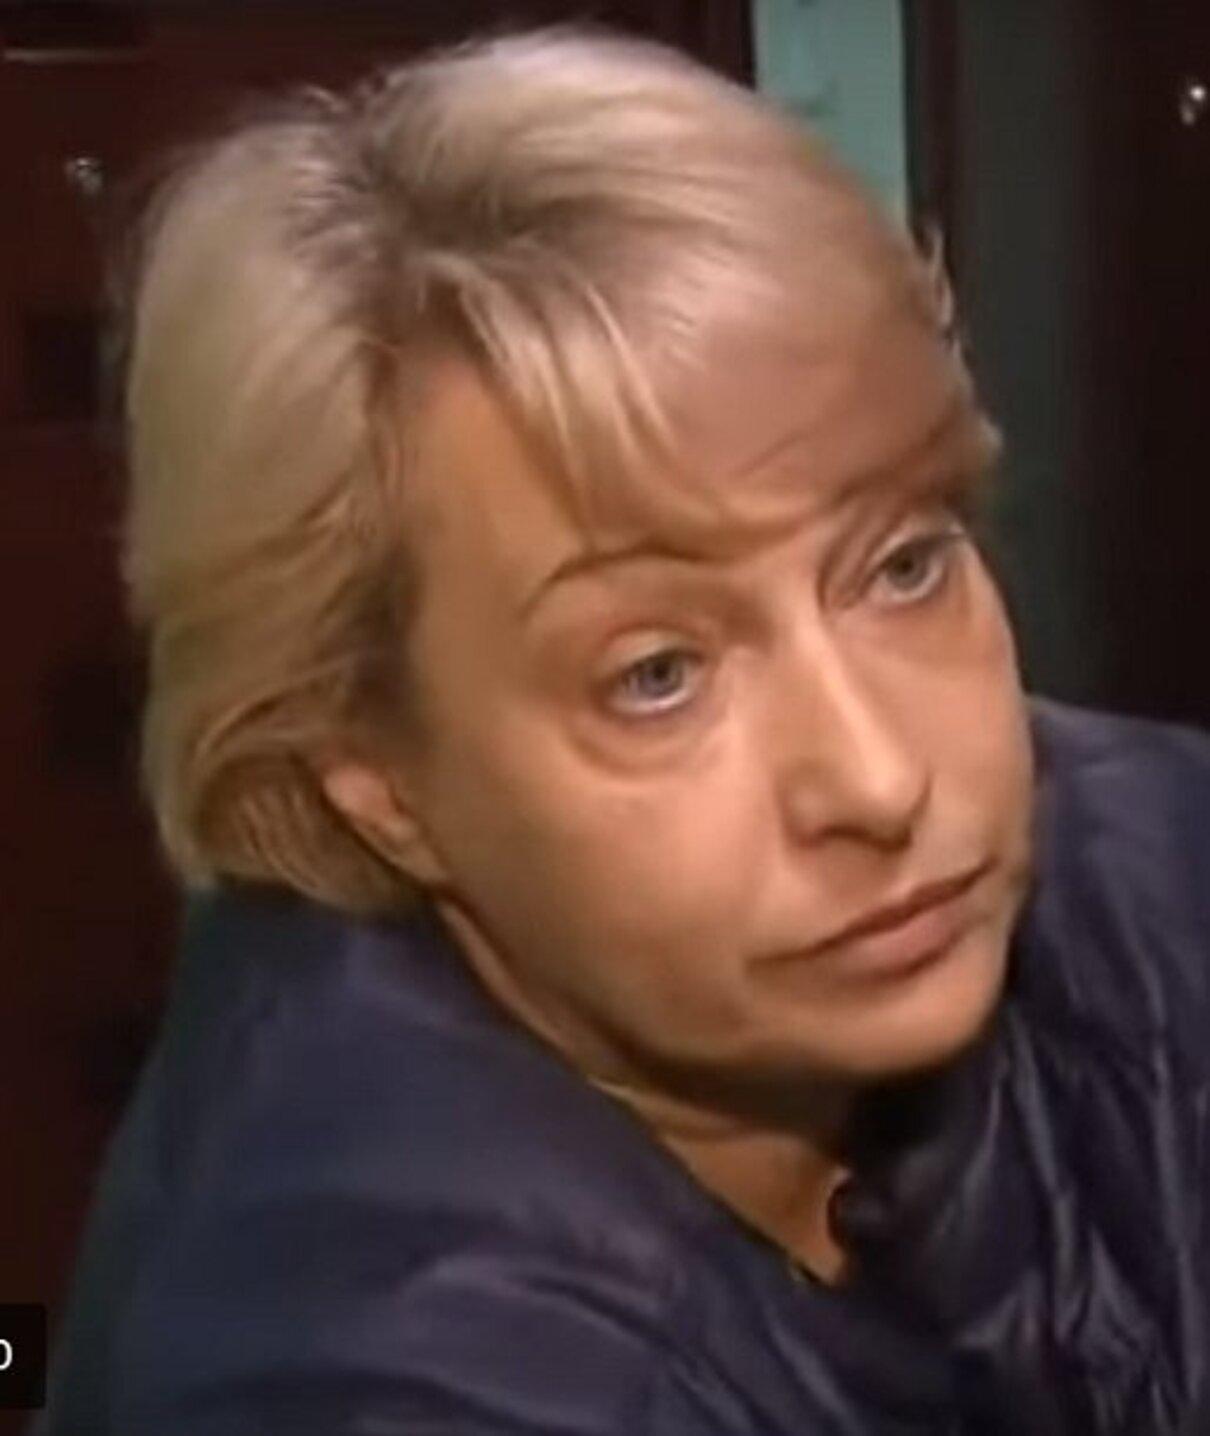 Жалоба-отзыв: ИП Козлова Юлия Константиновна (ИНН 772023898772) - ИП Козлова Юлия Константиновна